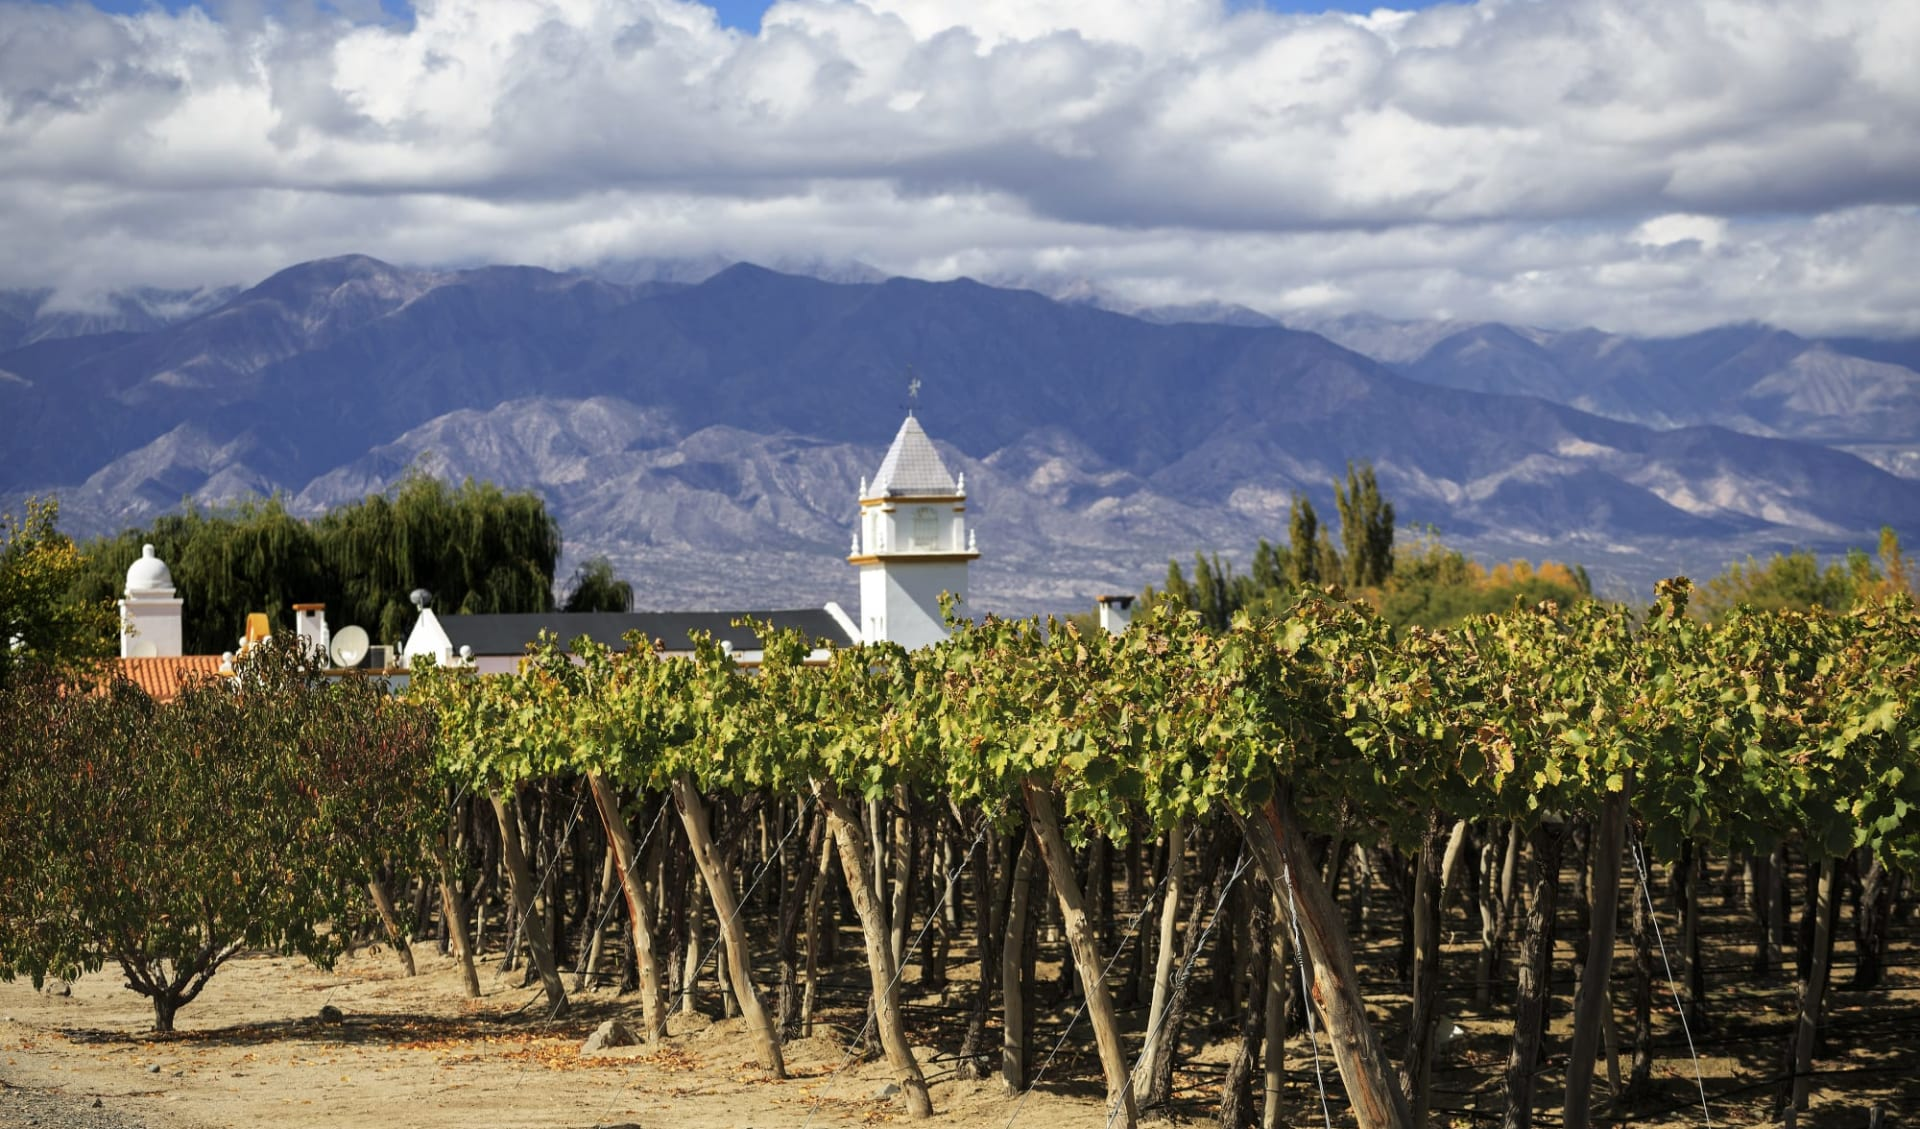 Salta - Salta: Argentinien - Cafayate - Vineyard